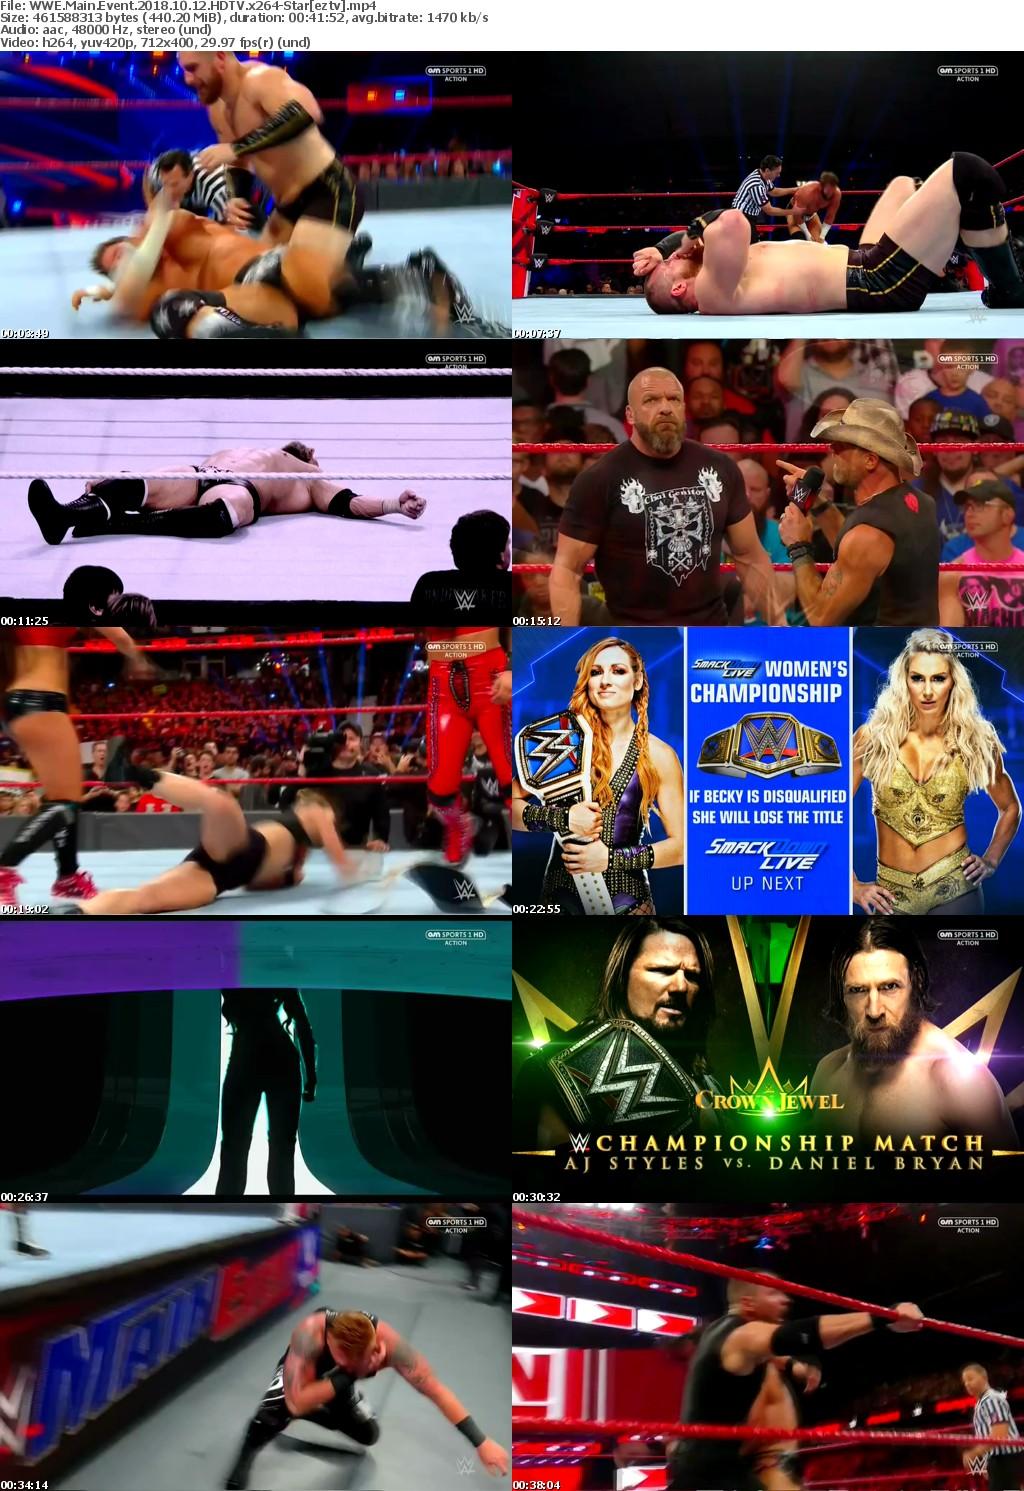 WWE Main Event 2018 10 12 HDTV x264-Star